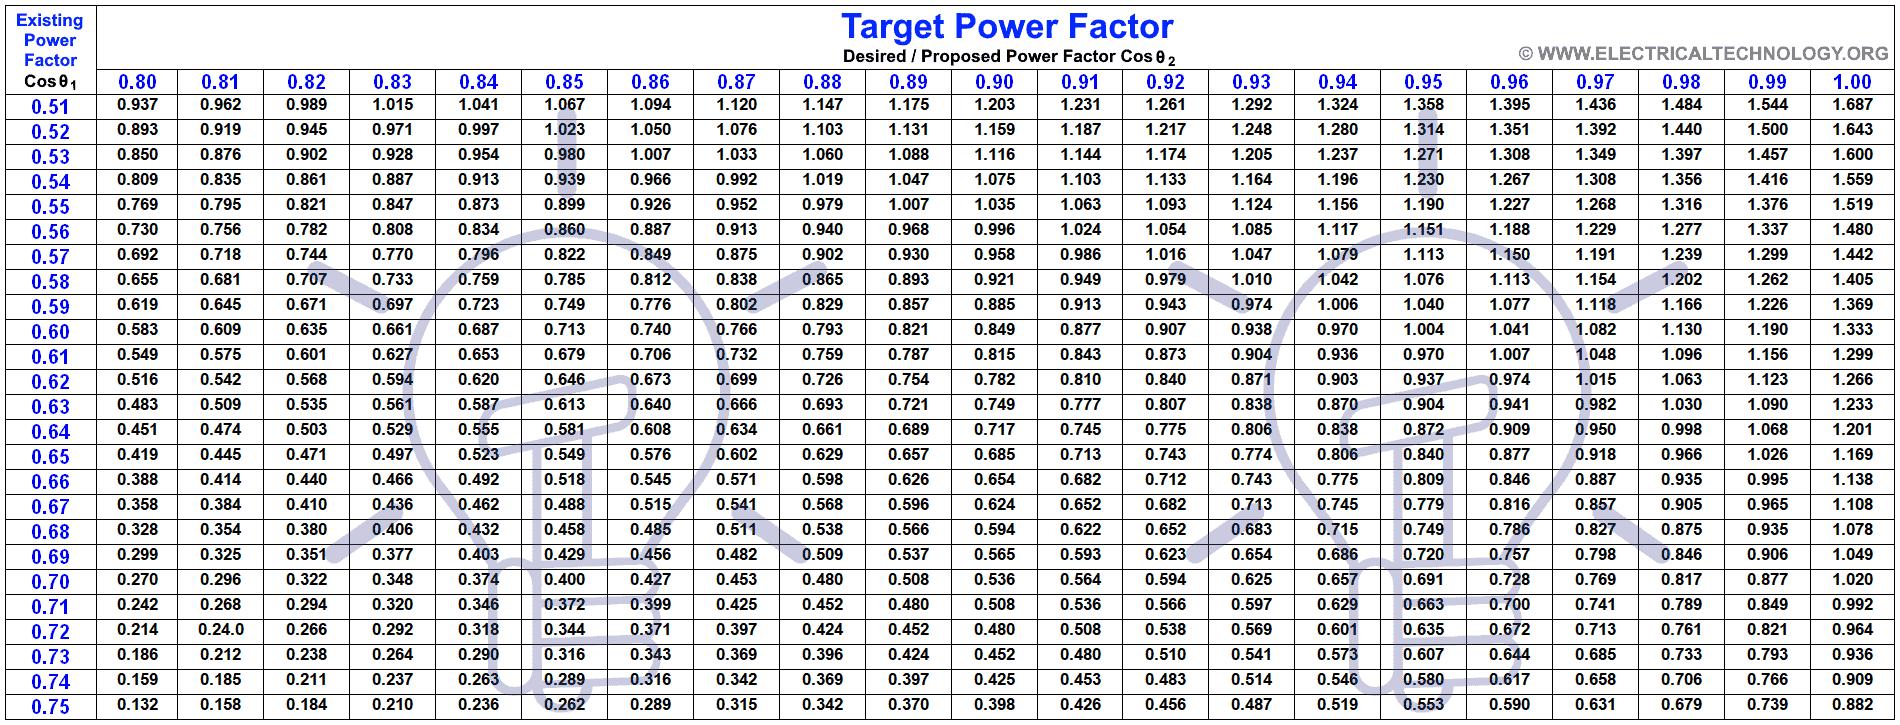 Power Factor Improvement Table